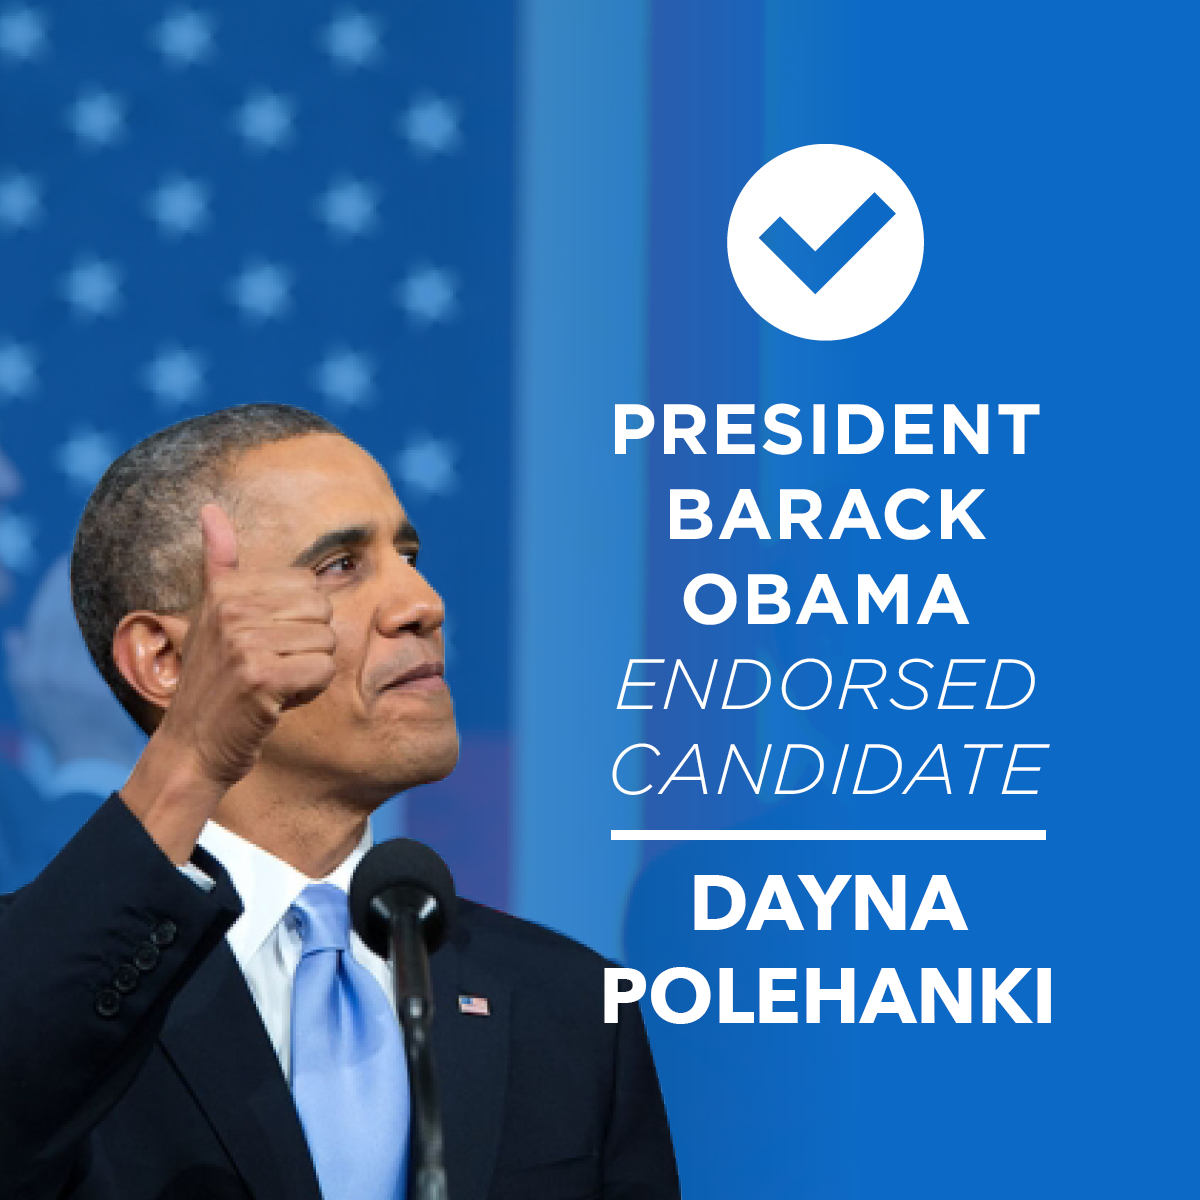 polehanki_obama-spotlight.png